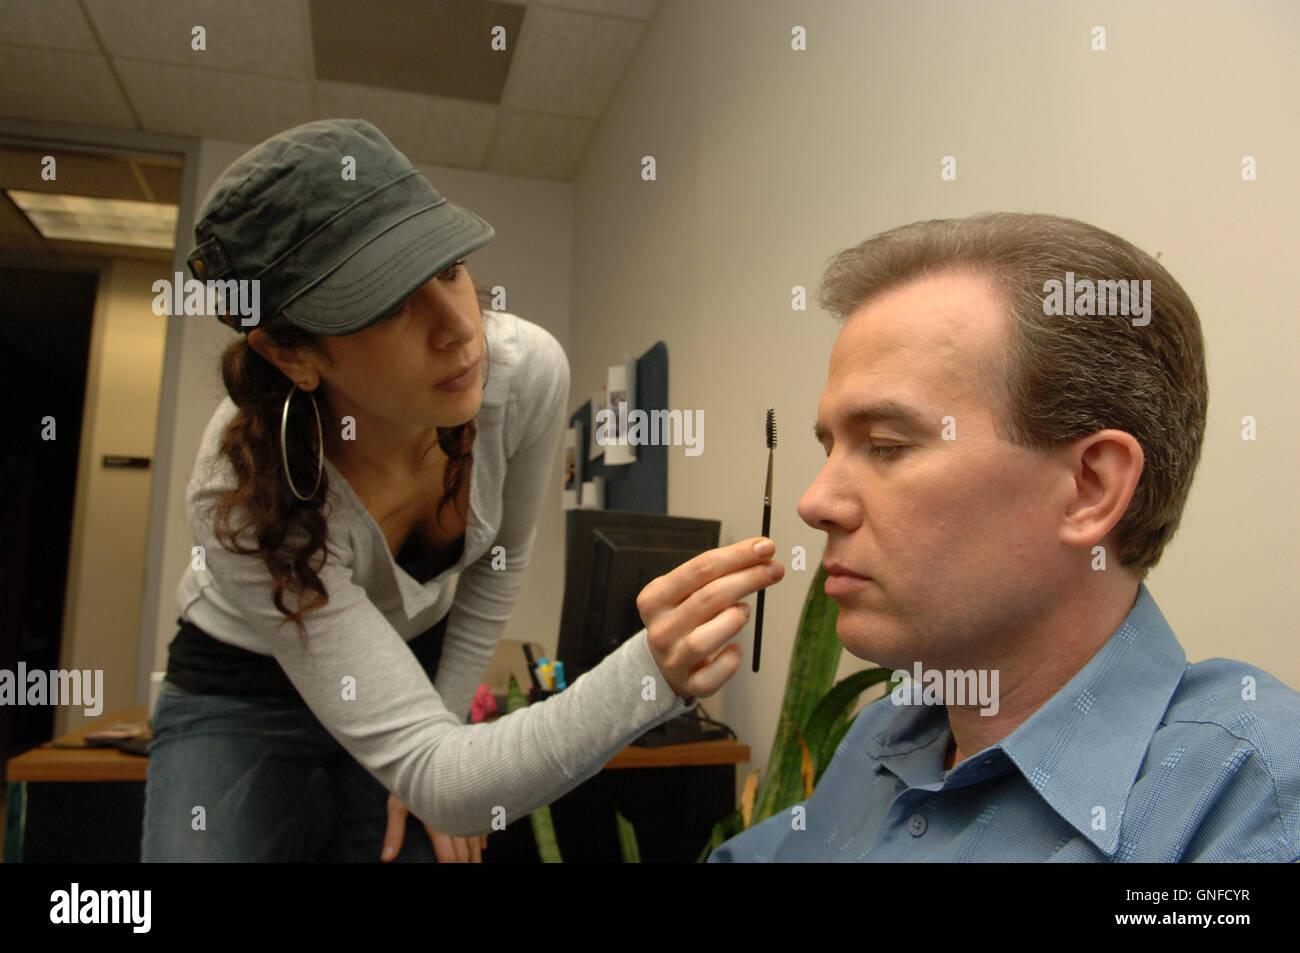 Atlanta Ga Usa 17th Aug 2007 John Mark Karr Is Prepped By Makeup Stock Photo Alamy